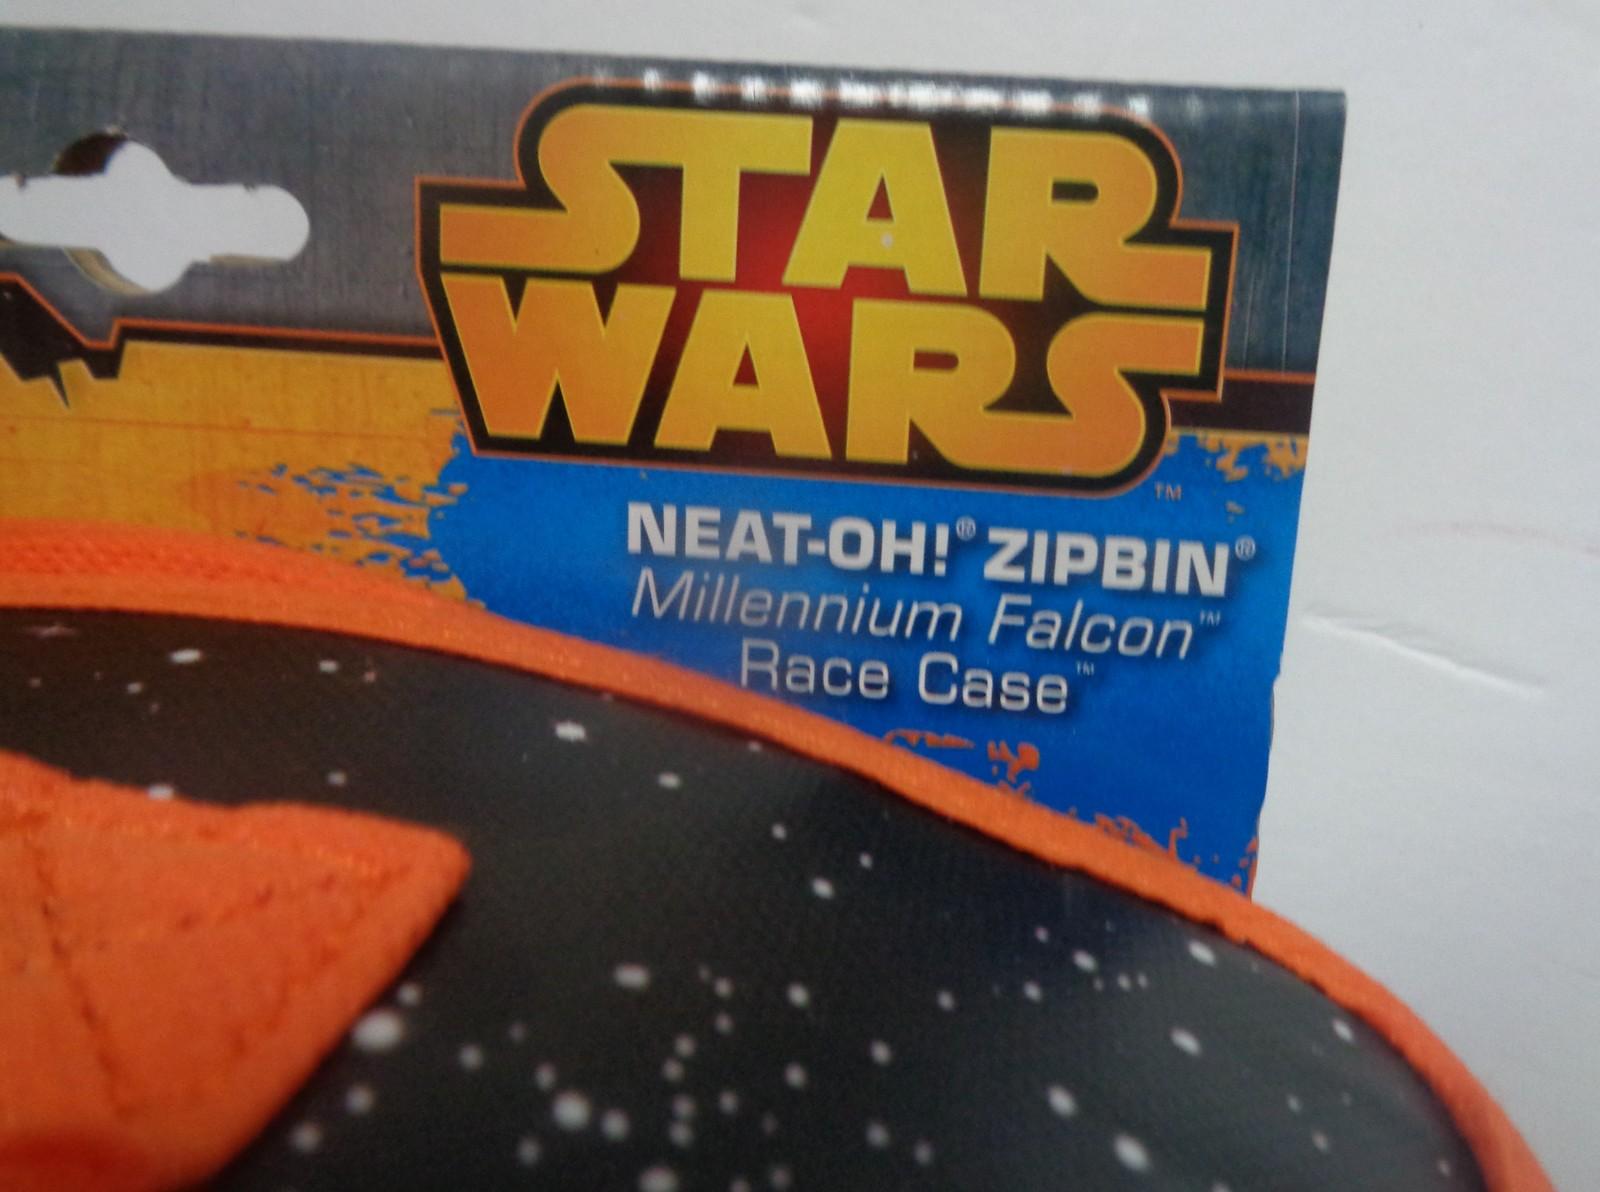 Star Wars Neat-Oh! Zipbin Storage & Play Case NWT Age 3+ Millennium Falcon